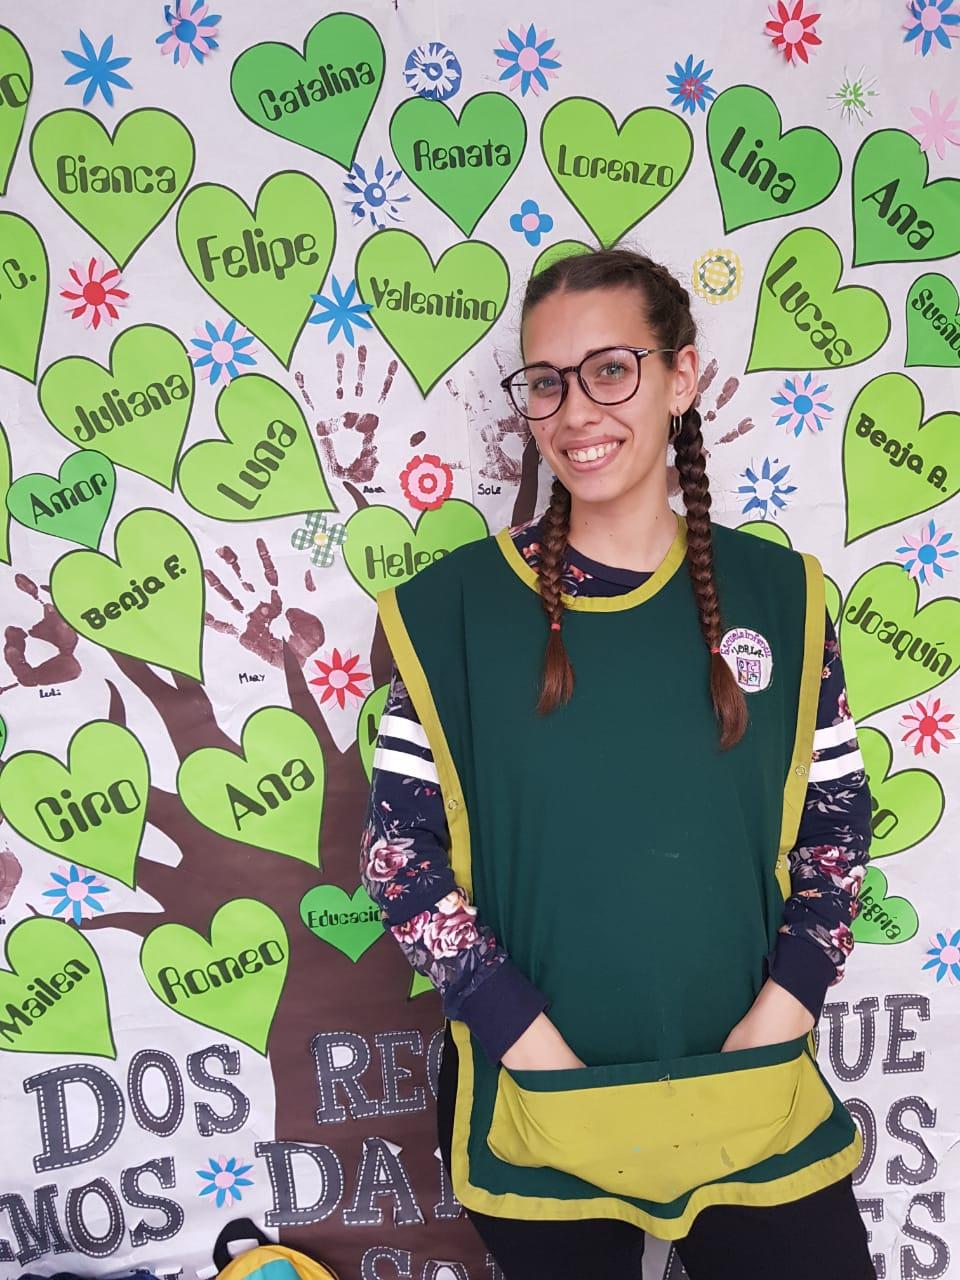 Maestra Jardin Loria Escuela